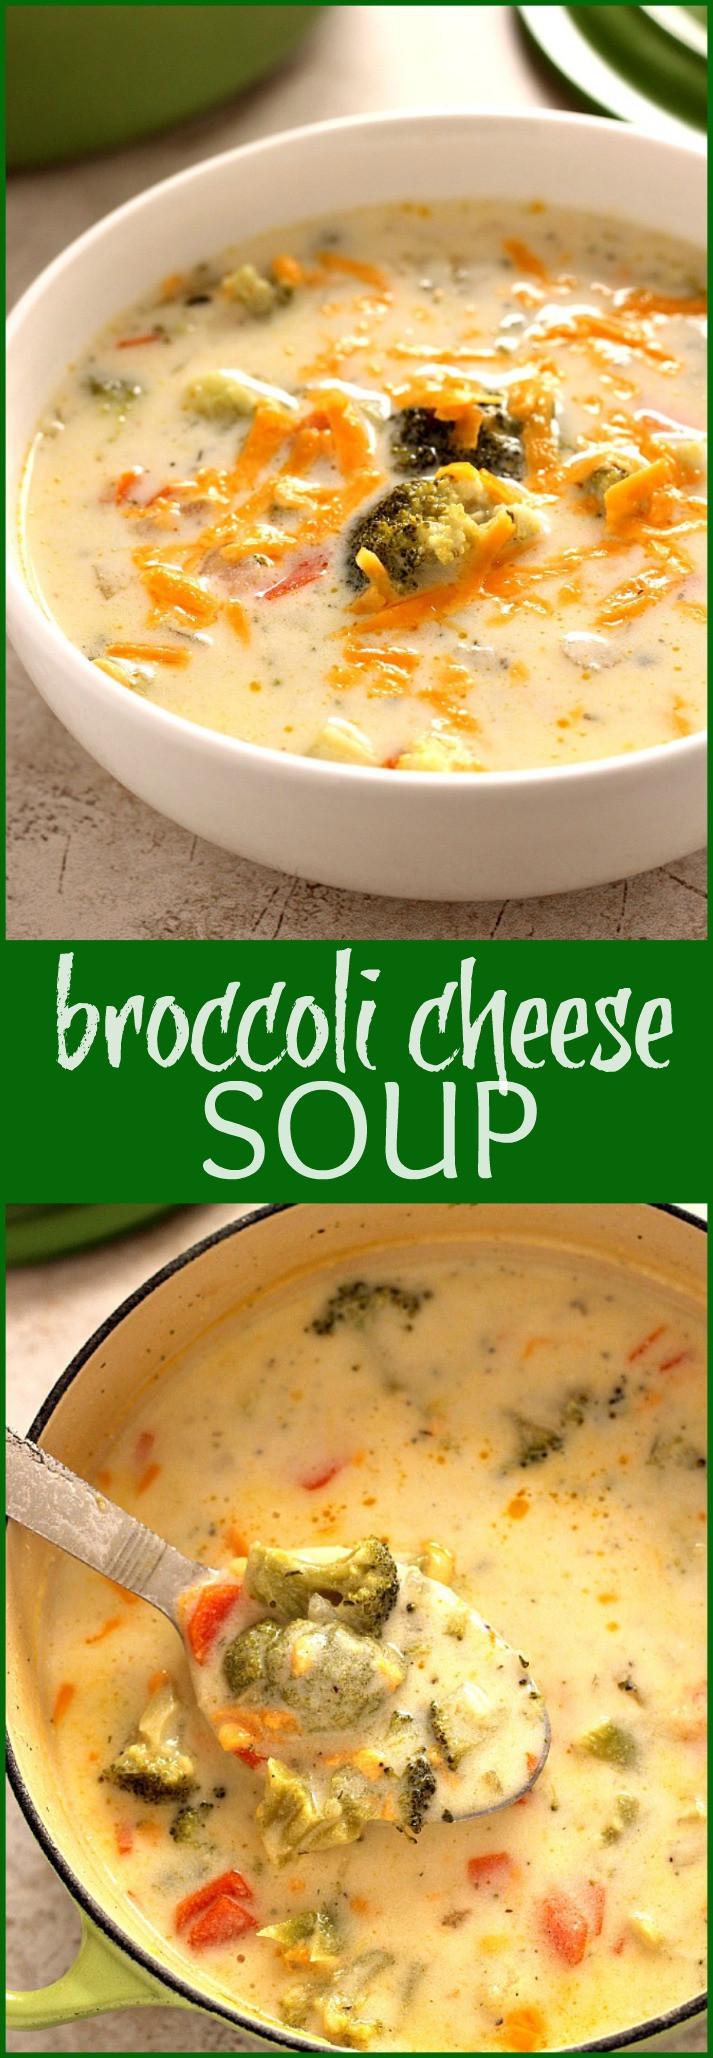 Panera Broccoli Cheddar Soup Recipe  Broccoli Cheese Soup Panera Copycat Crunchy Creamy Sweet